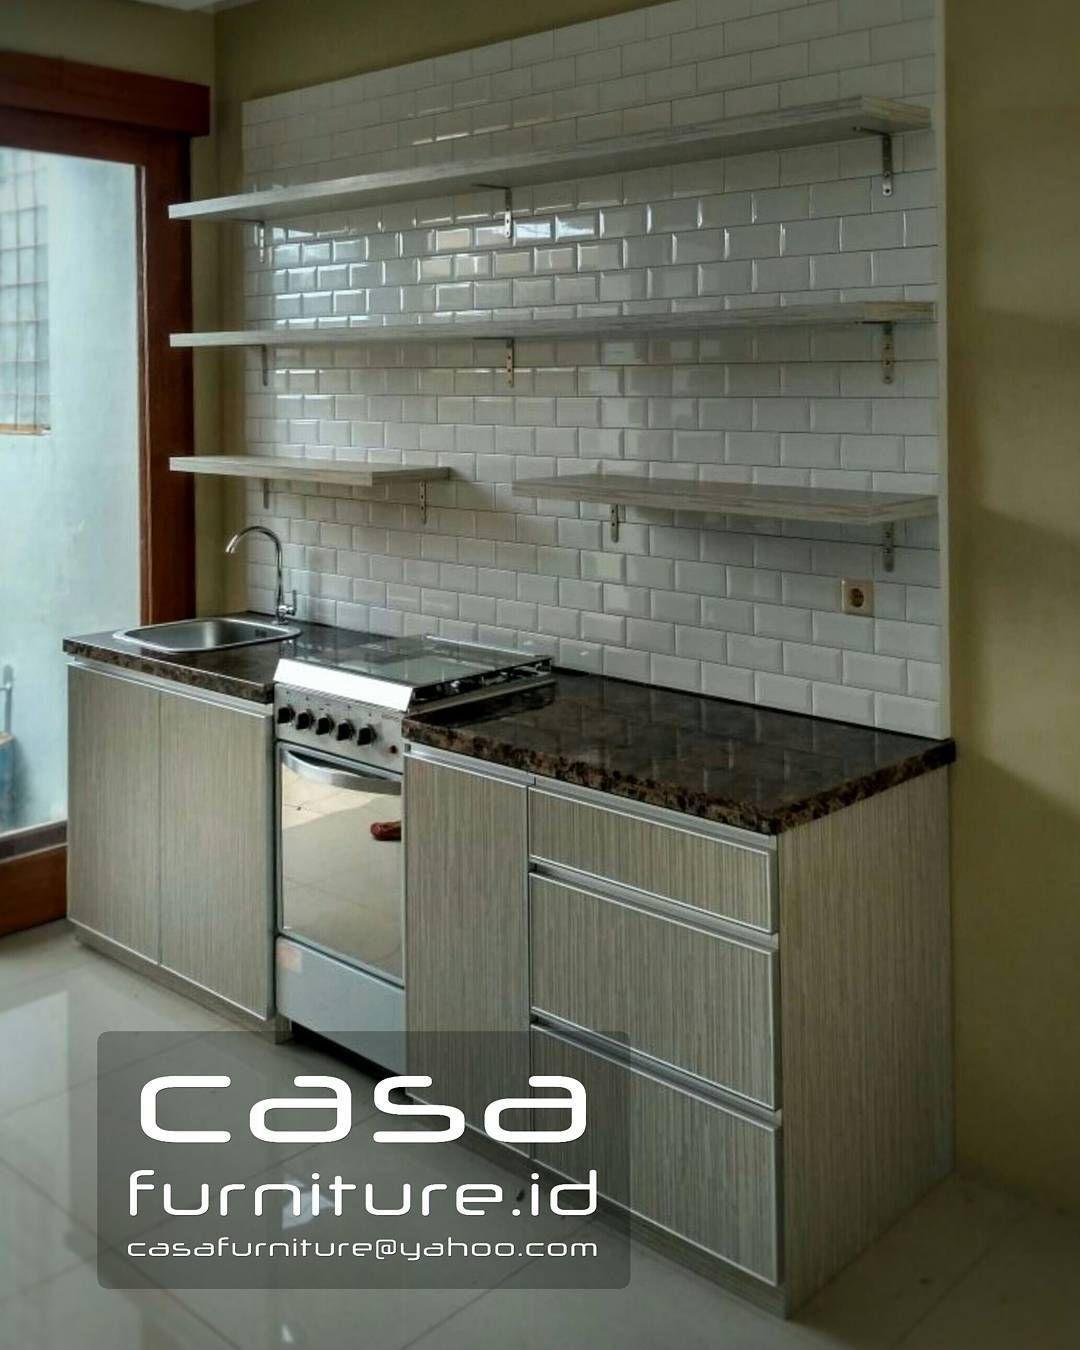 Pin oleh casafurniture id di kitchen set lemari baju furniture apartemen jakarta finishing hpl harga permeter mulai 1 7jt di 2019 kitchen decor